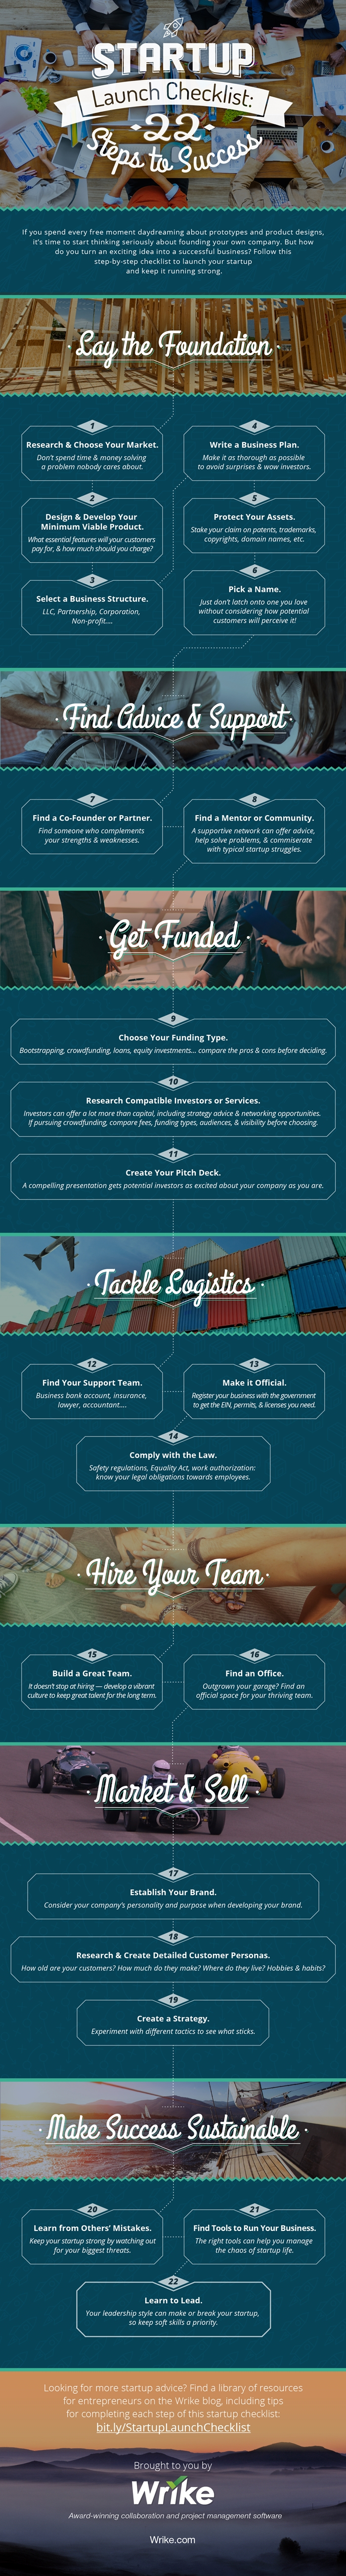 startup-launch-checklist-infographic-700